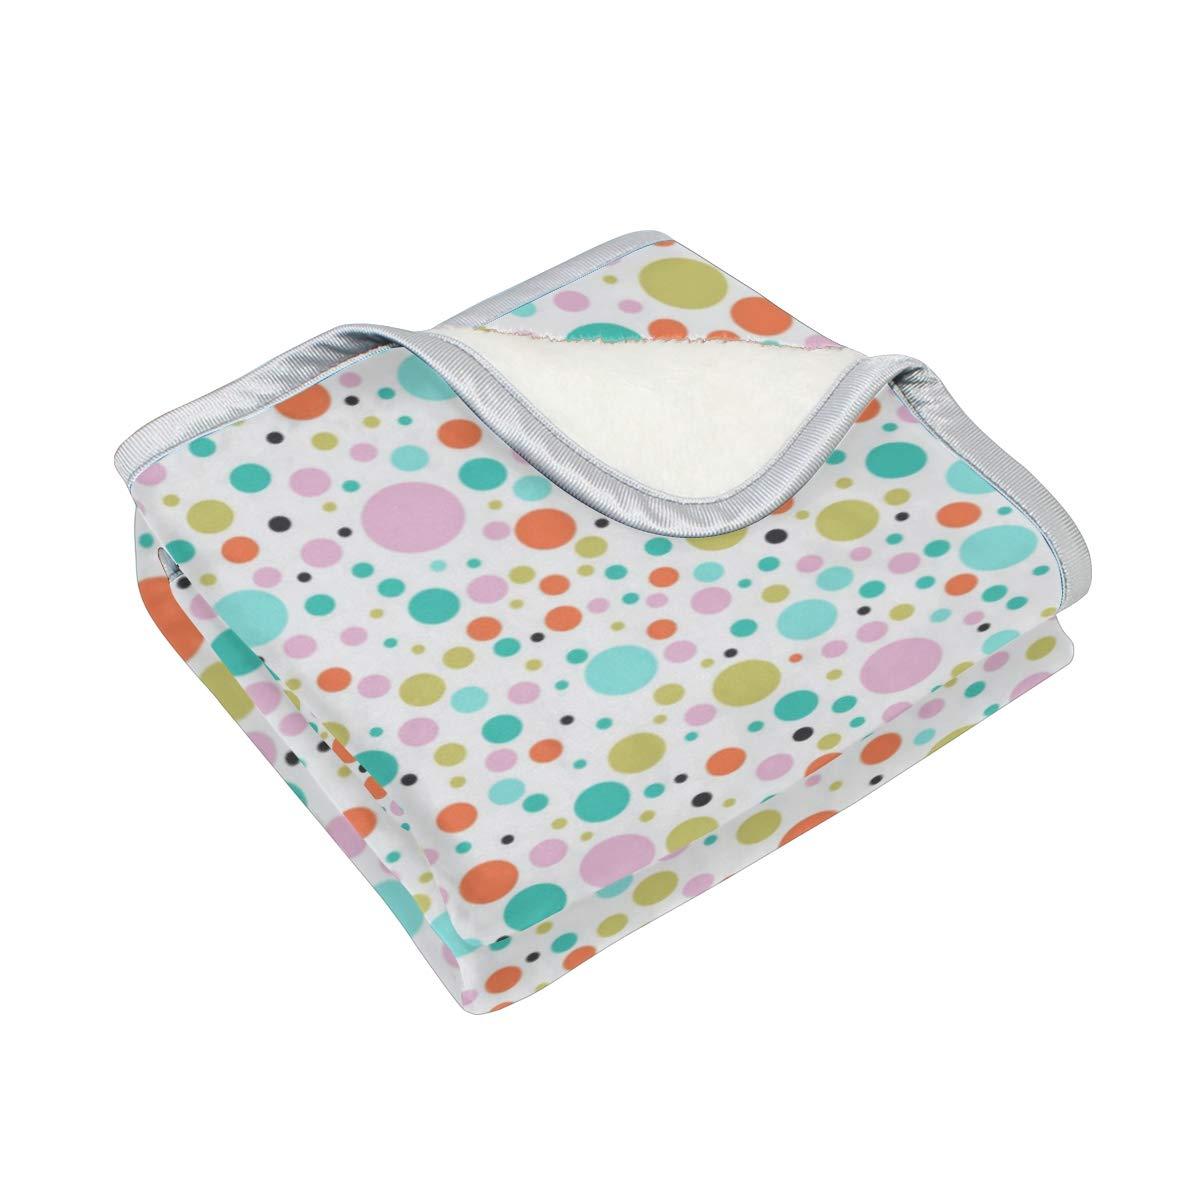 Amazon.com: CIXUAN Colorful Dots Print Throw Blanket Comfort ...